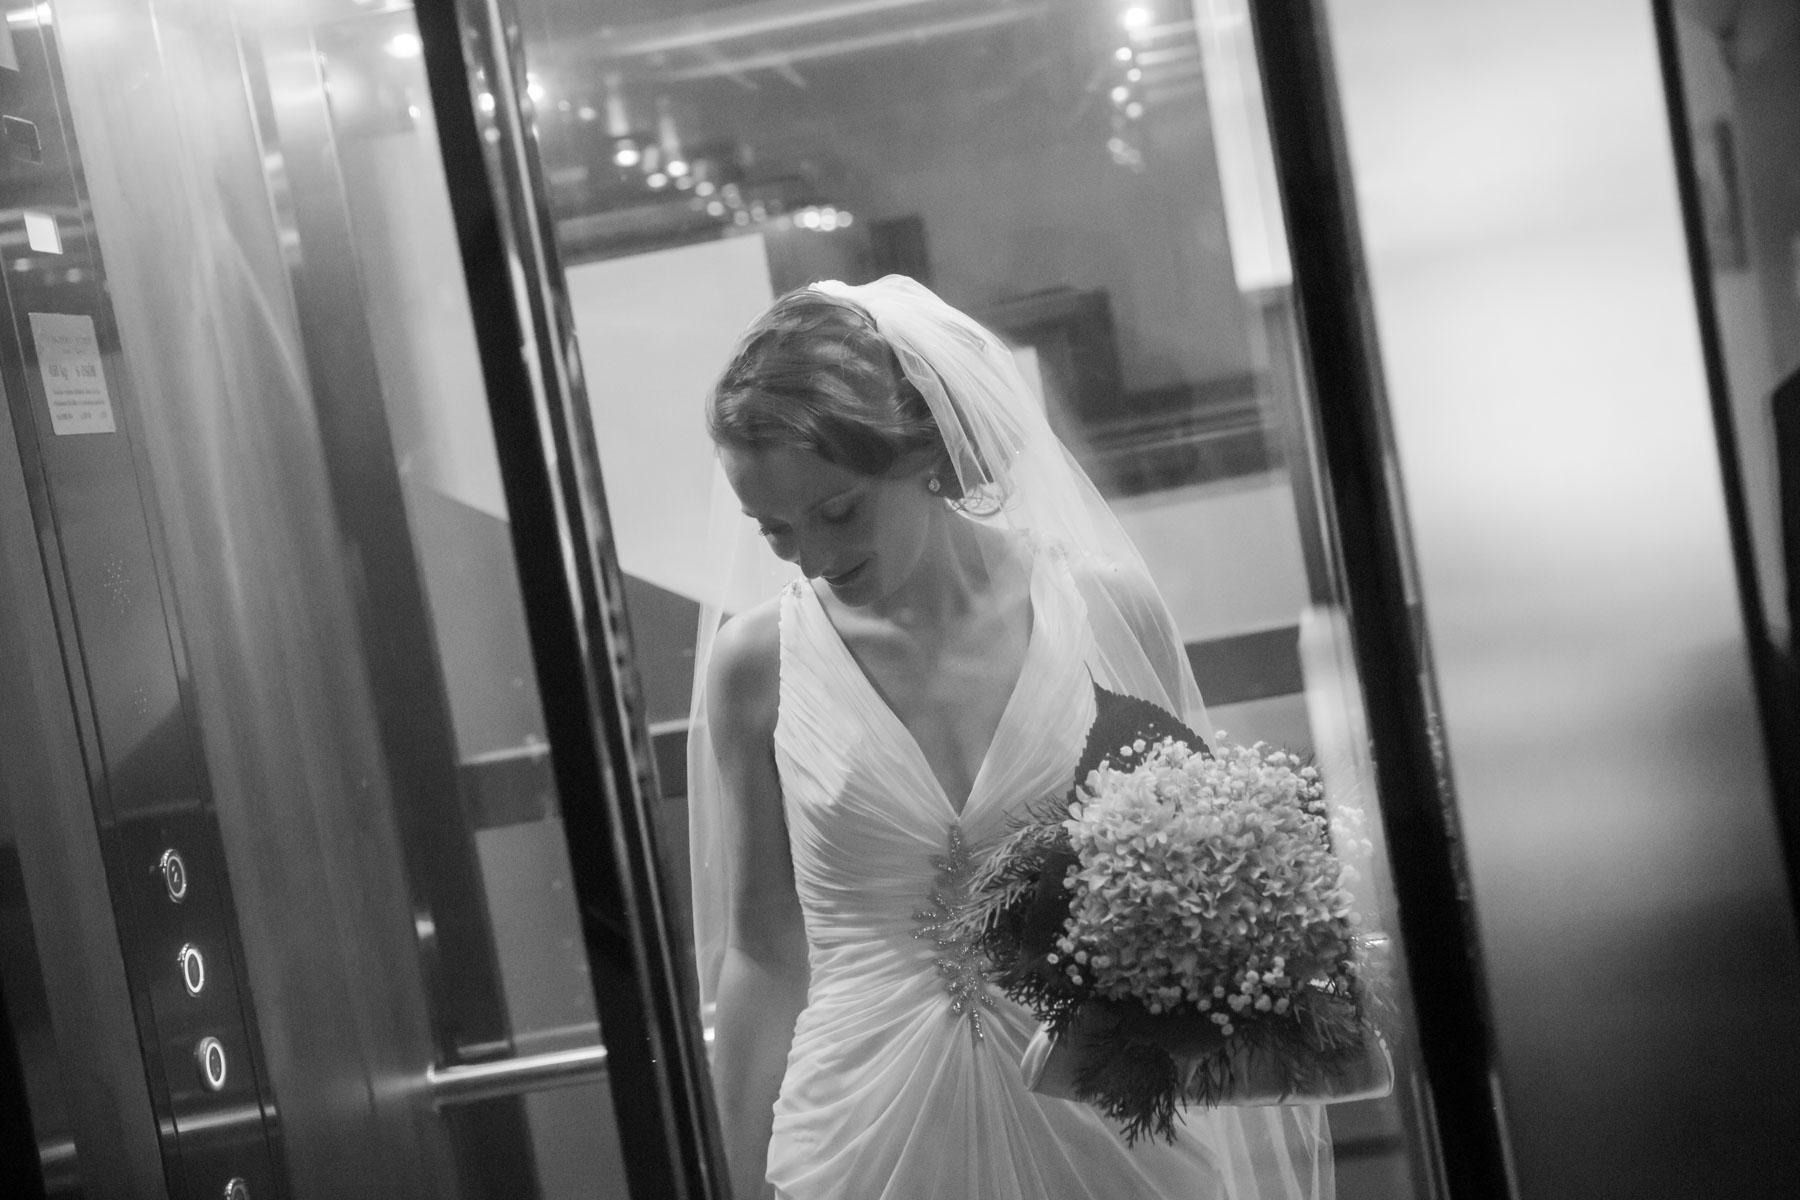 Slovakian Destination Wedding Photography by London-based Wedding Photographer Richard Murgatroyd